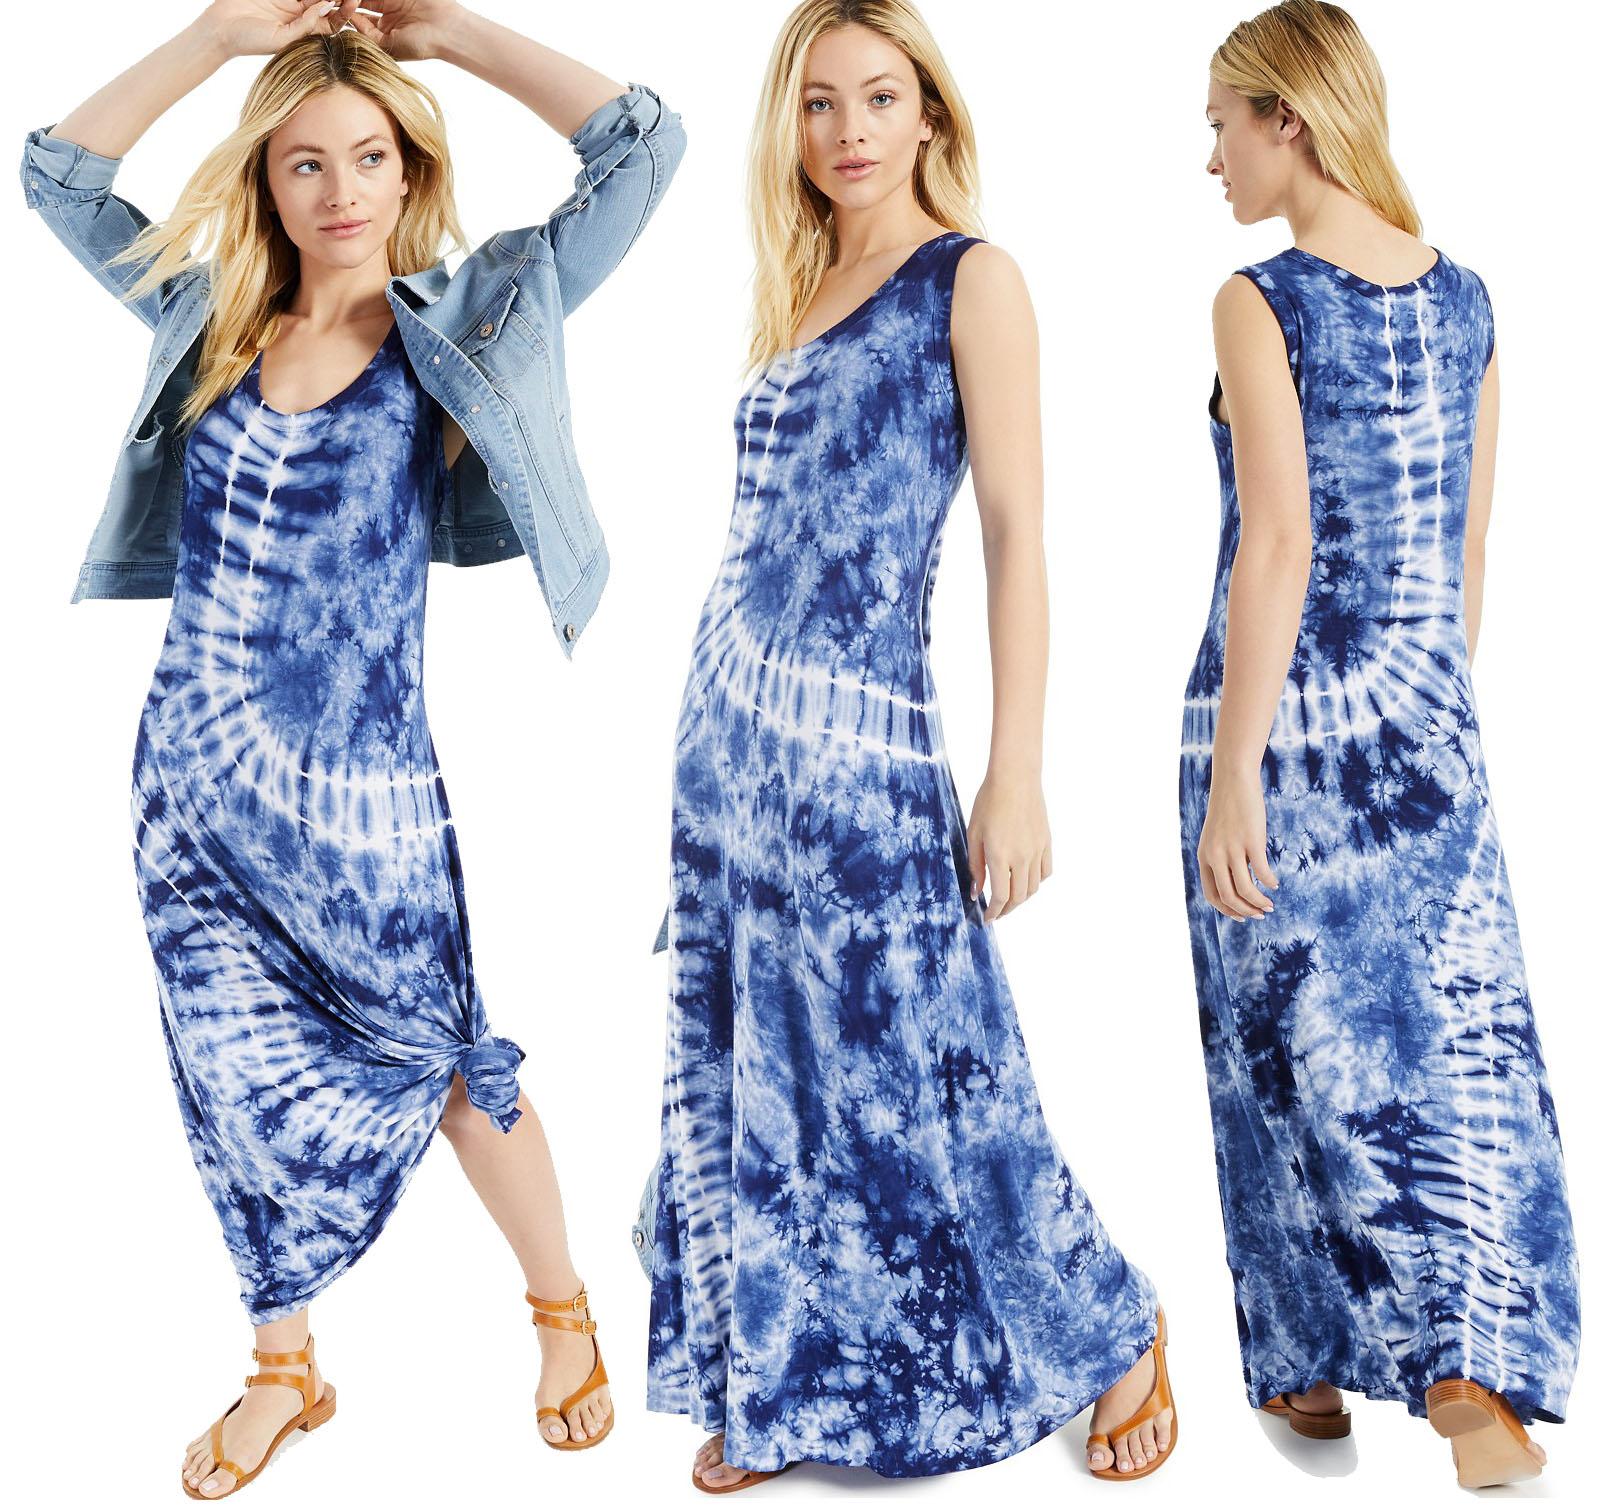 What is summer without a tie-dye print dress like Style & Co's tie-dye maxi dress in swing silhouette?